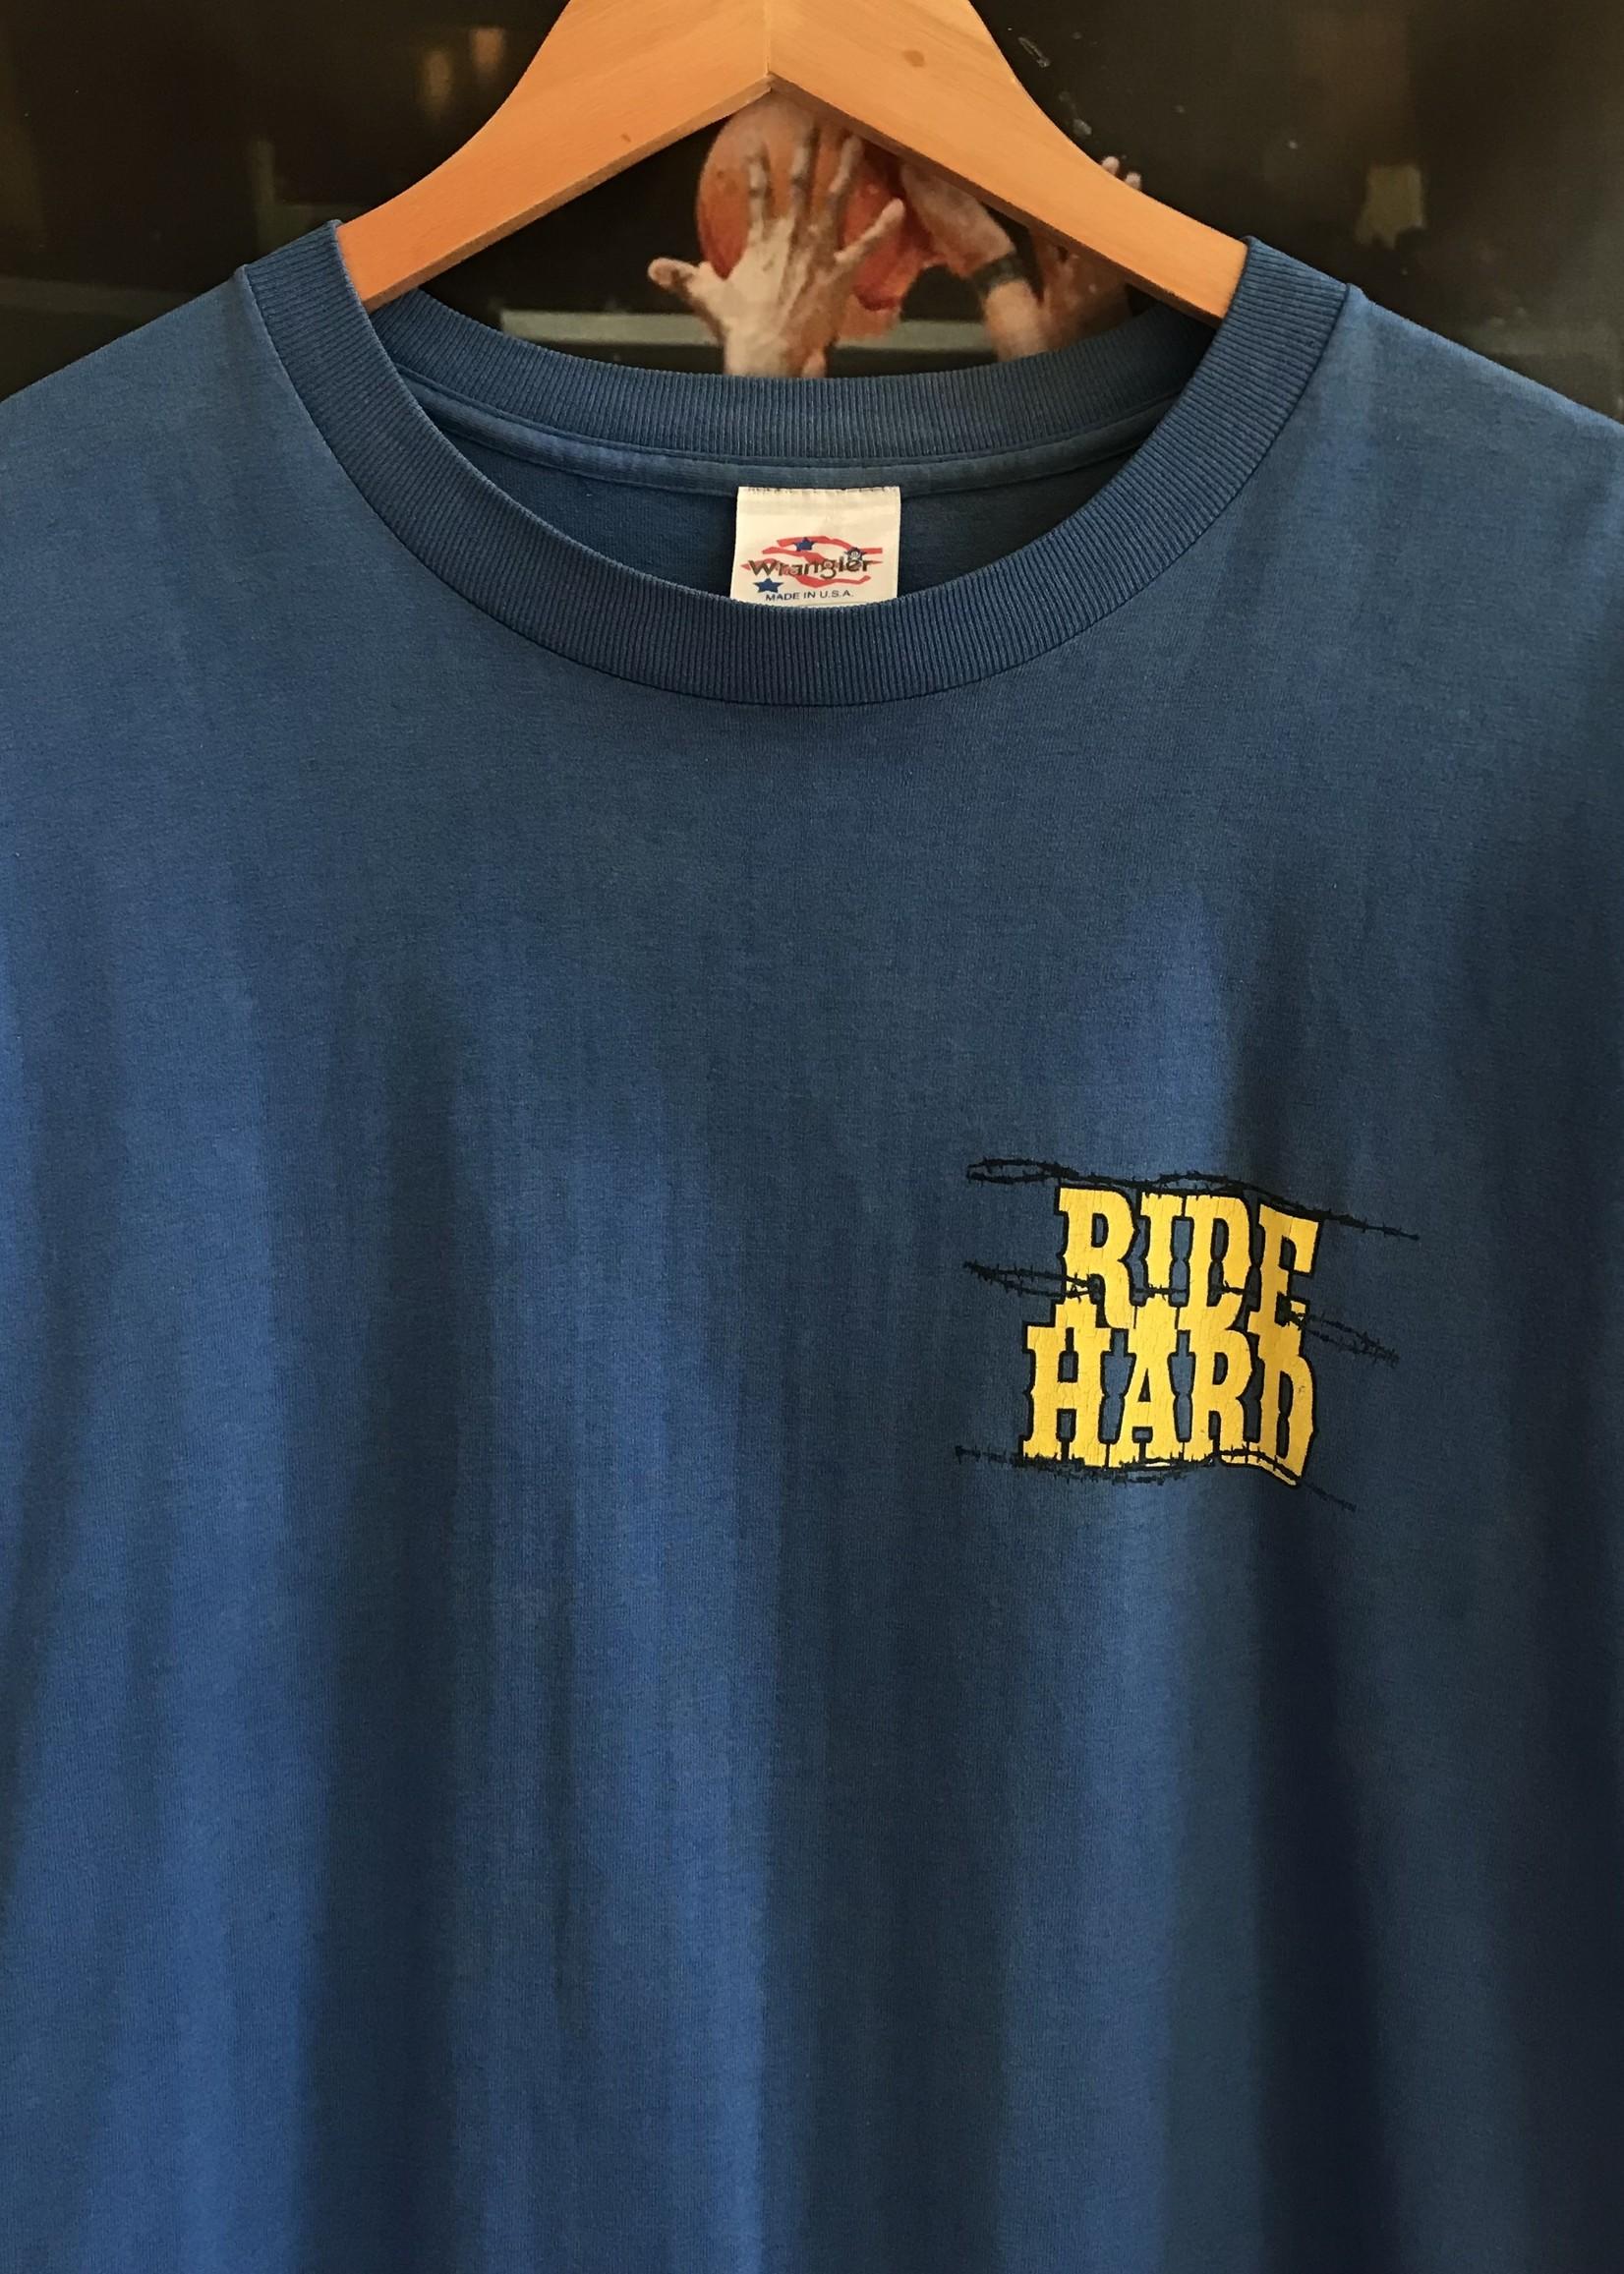 4946wrangler ride hard tee blue sz XL